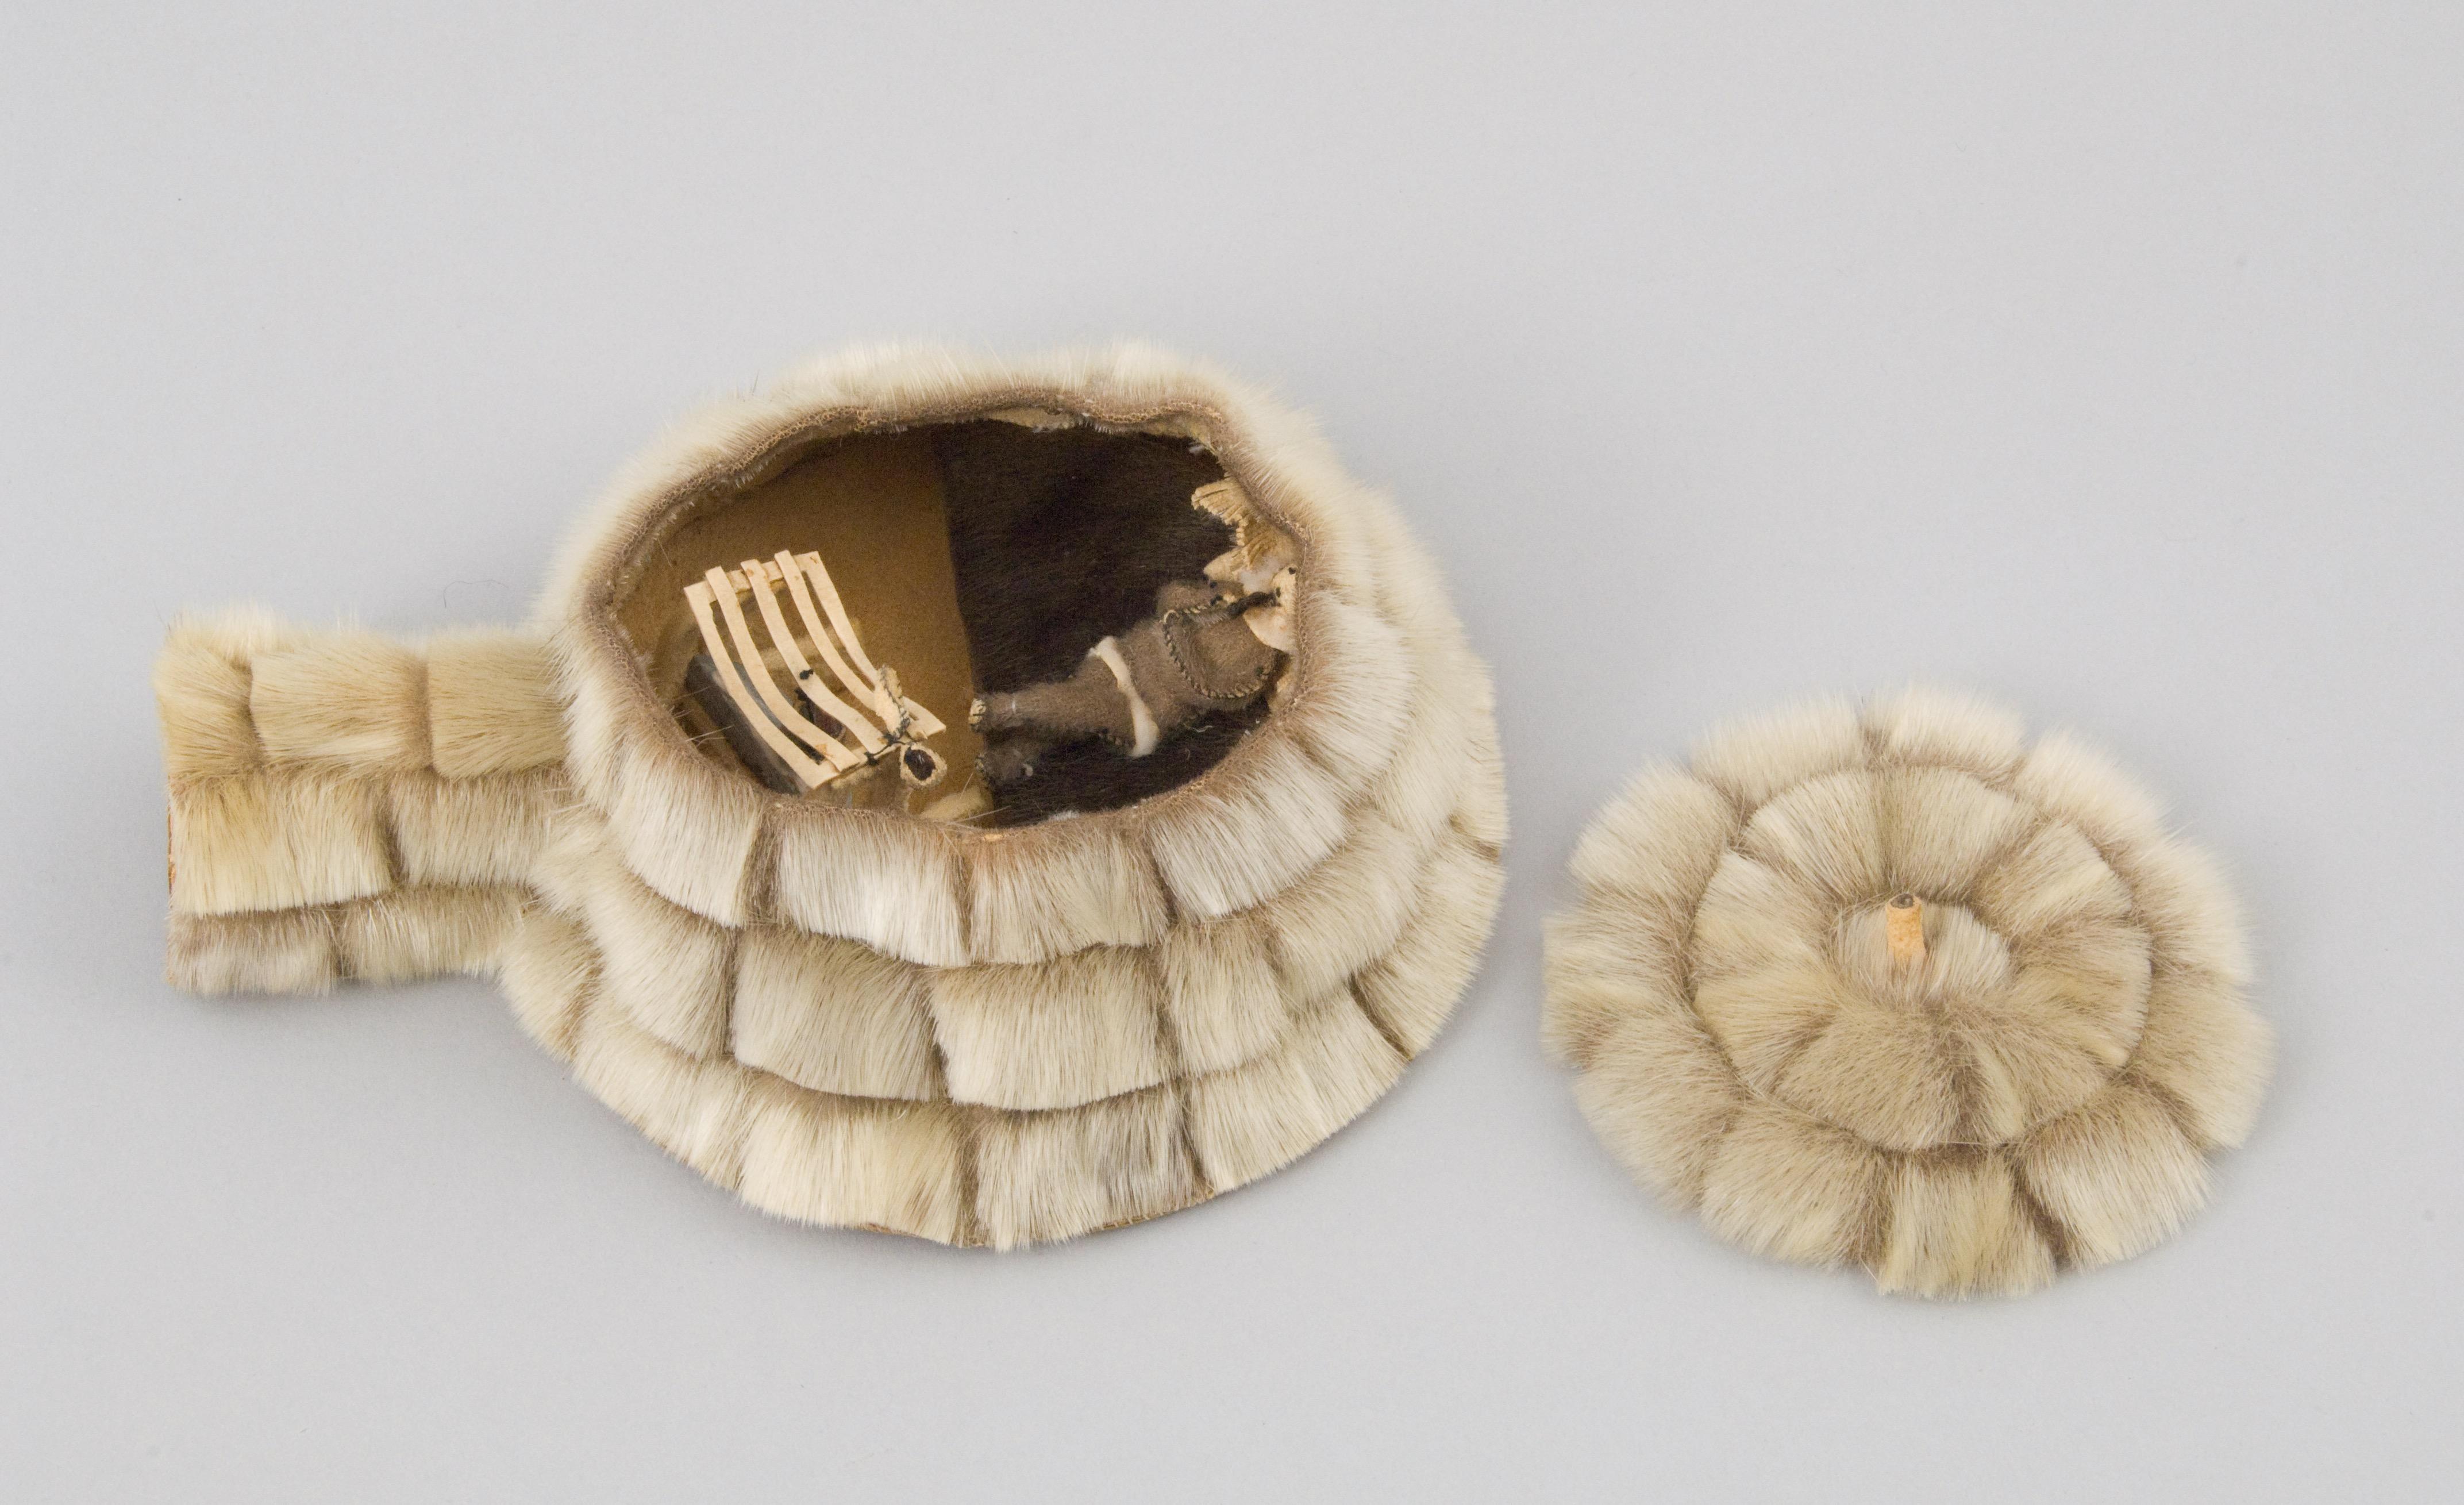 Model igloo